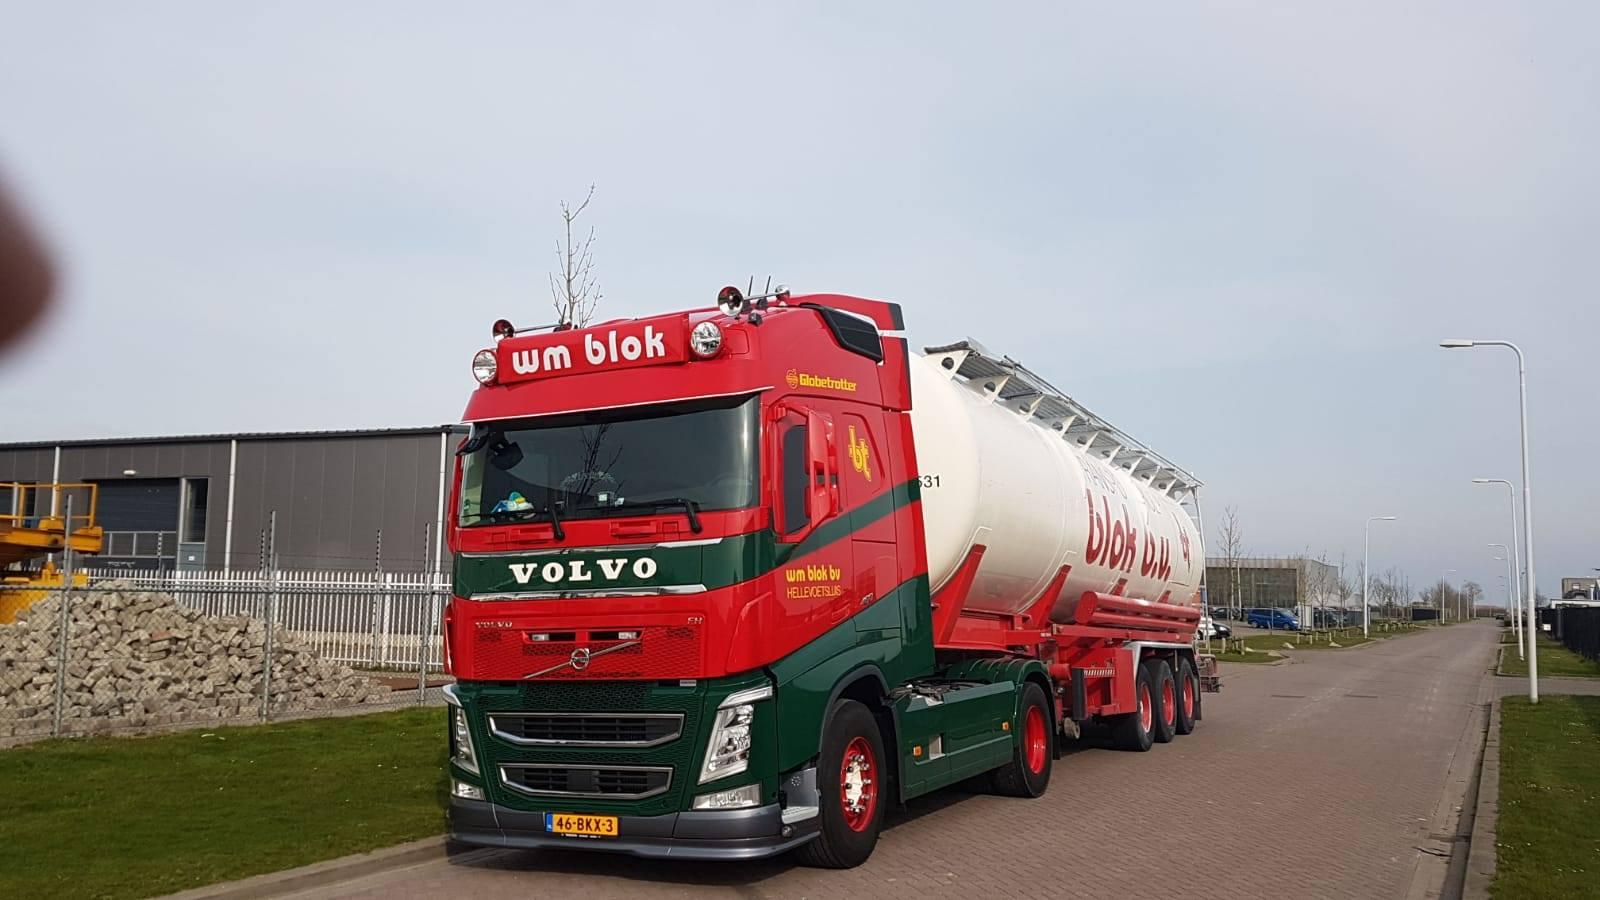 Stefan-van-Peperstraten-en-Jaco-Geelhoed-18-4-2019--4